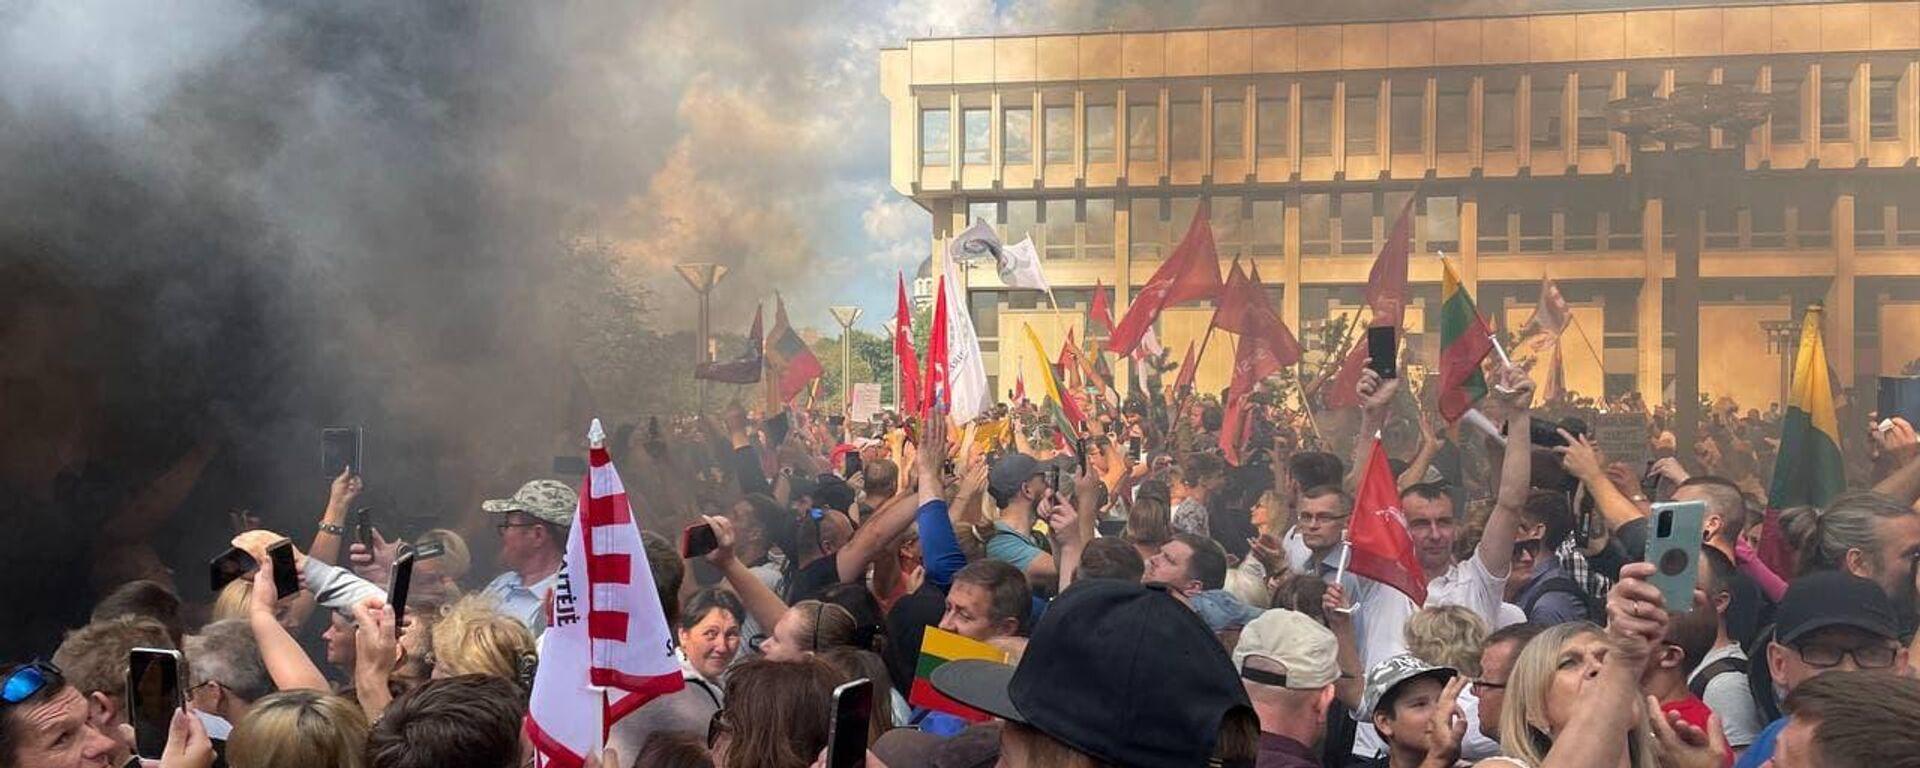 Акция протеста 10 августа 2021 в Вильнюсе у здания Сейма Литвы - Sputnik Латвия, 1920, 10.08.2021